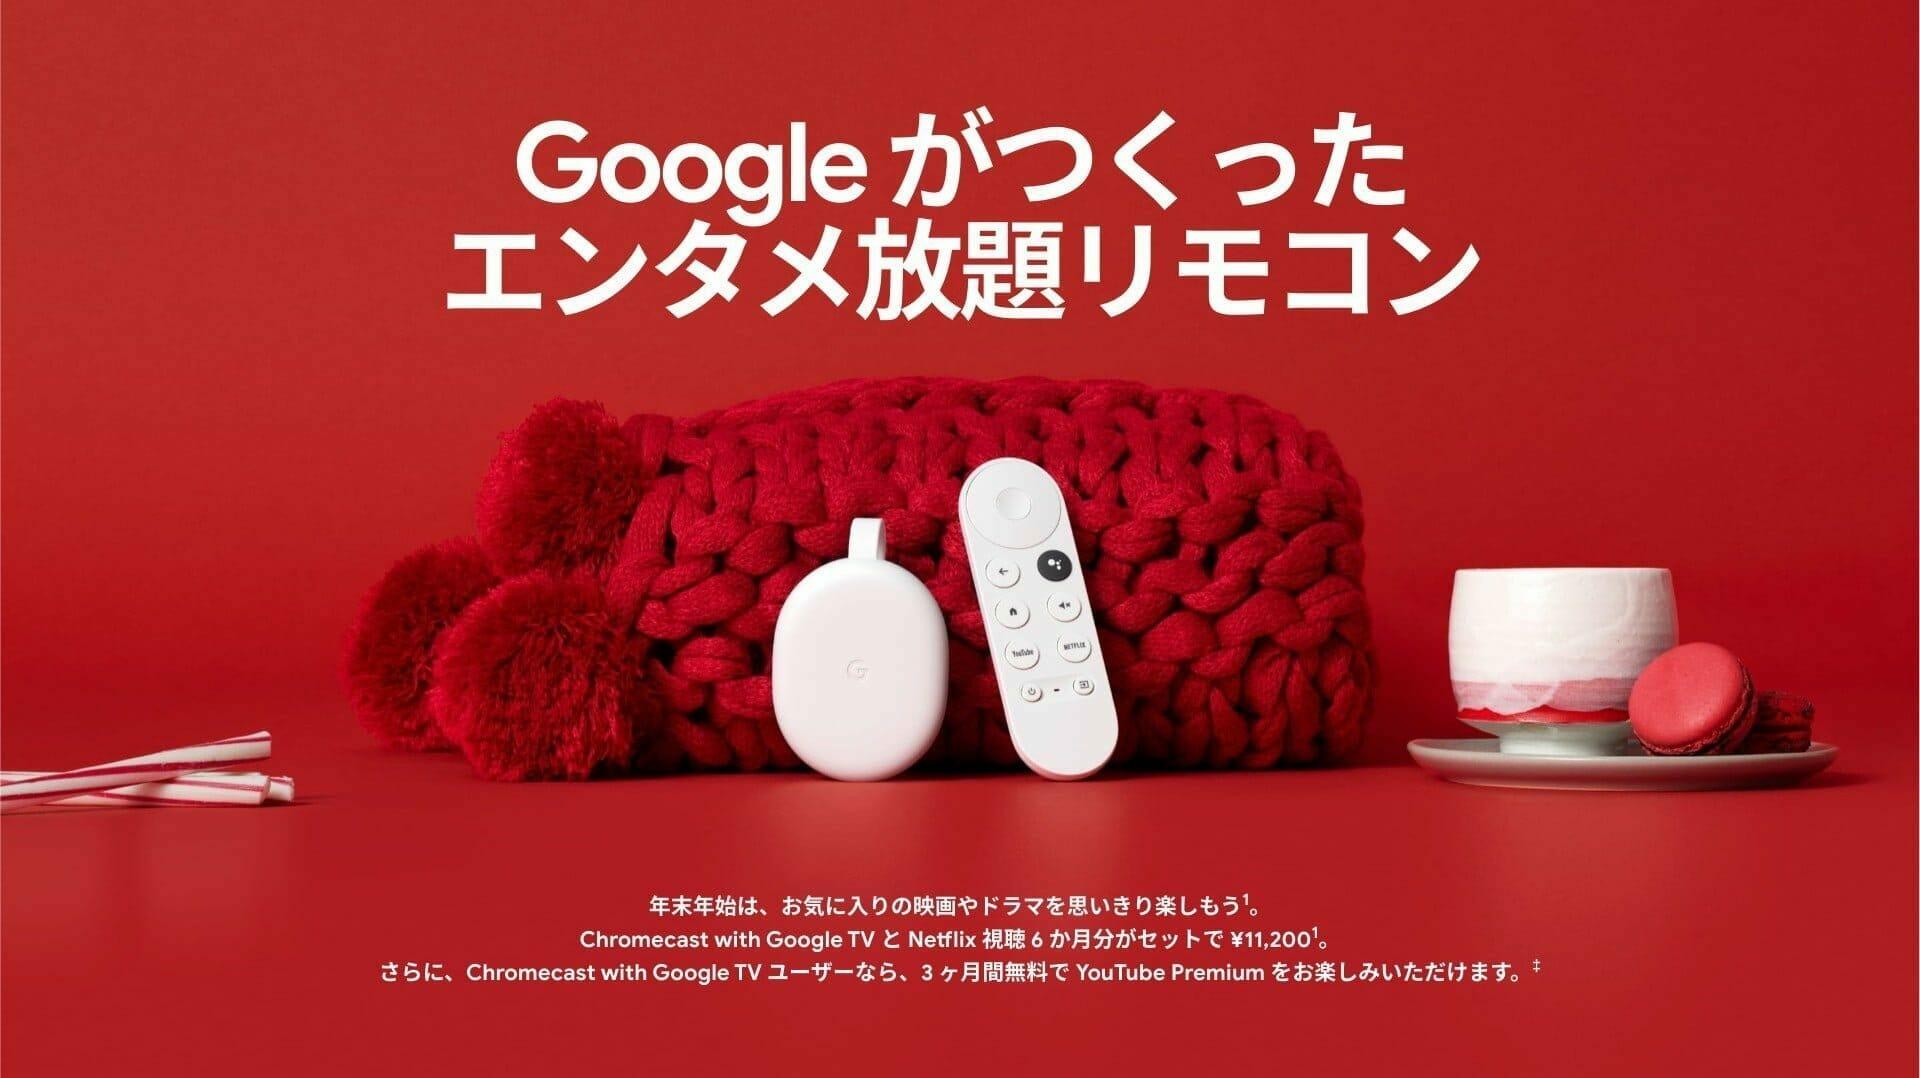 Google ホリデー デザイン:ストリーミング デバイス「Chromecast with Google TV」